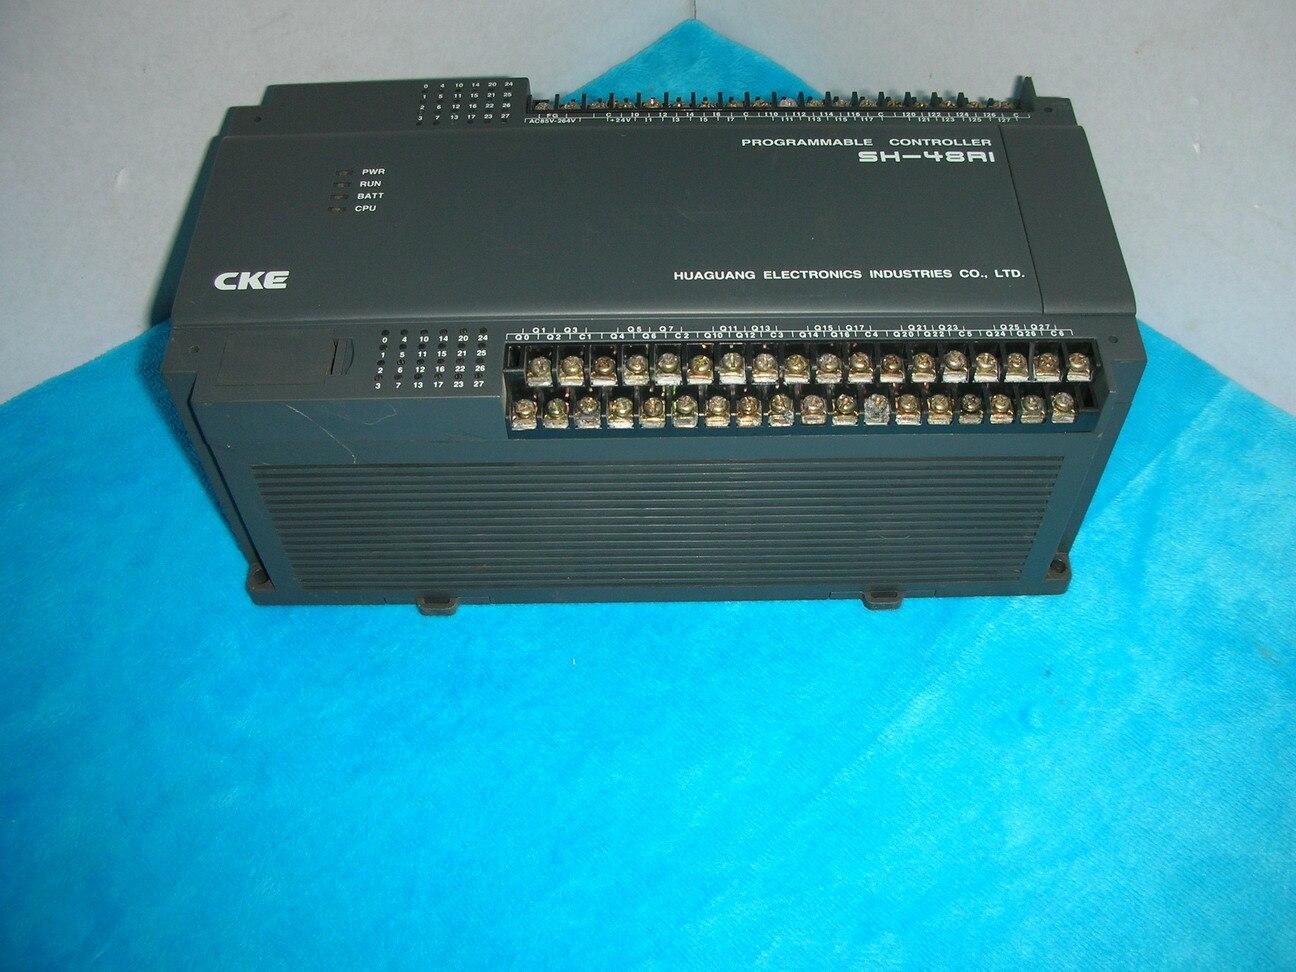 1PC USED PLC SH-48RI /SH-48R1 KOYO 1pc used guangyang koyo u 8adc 1